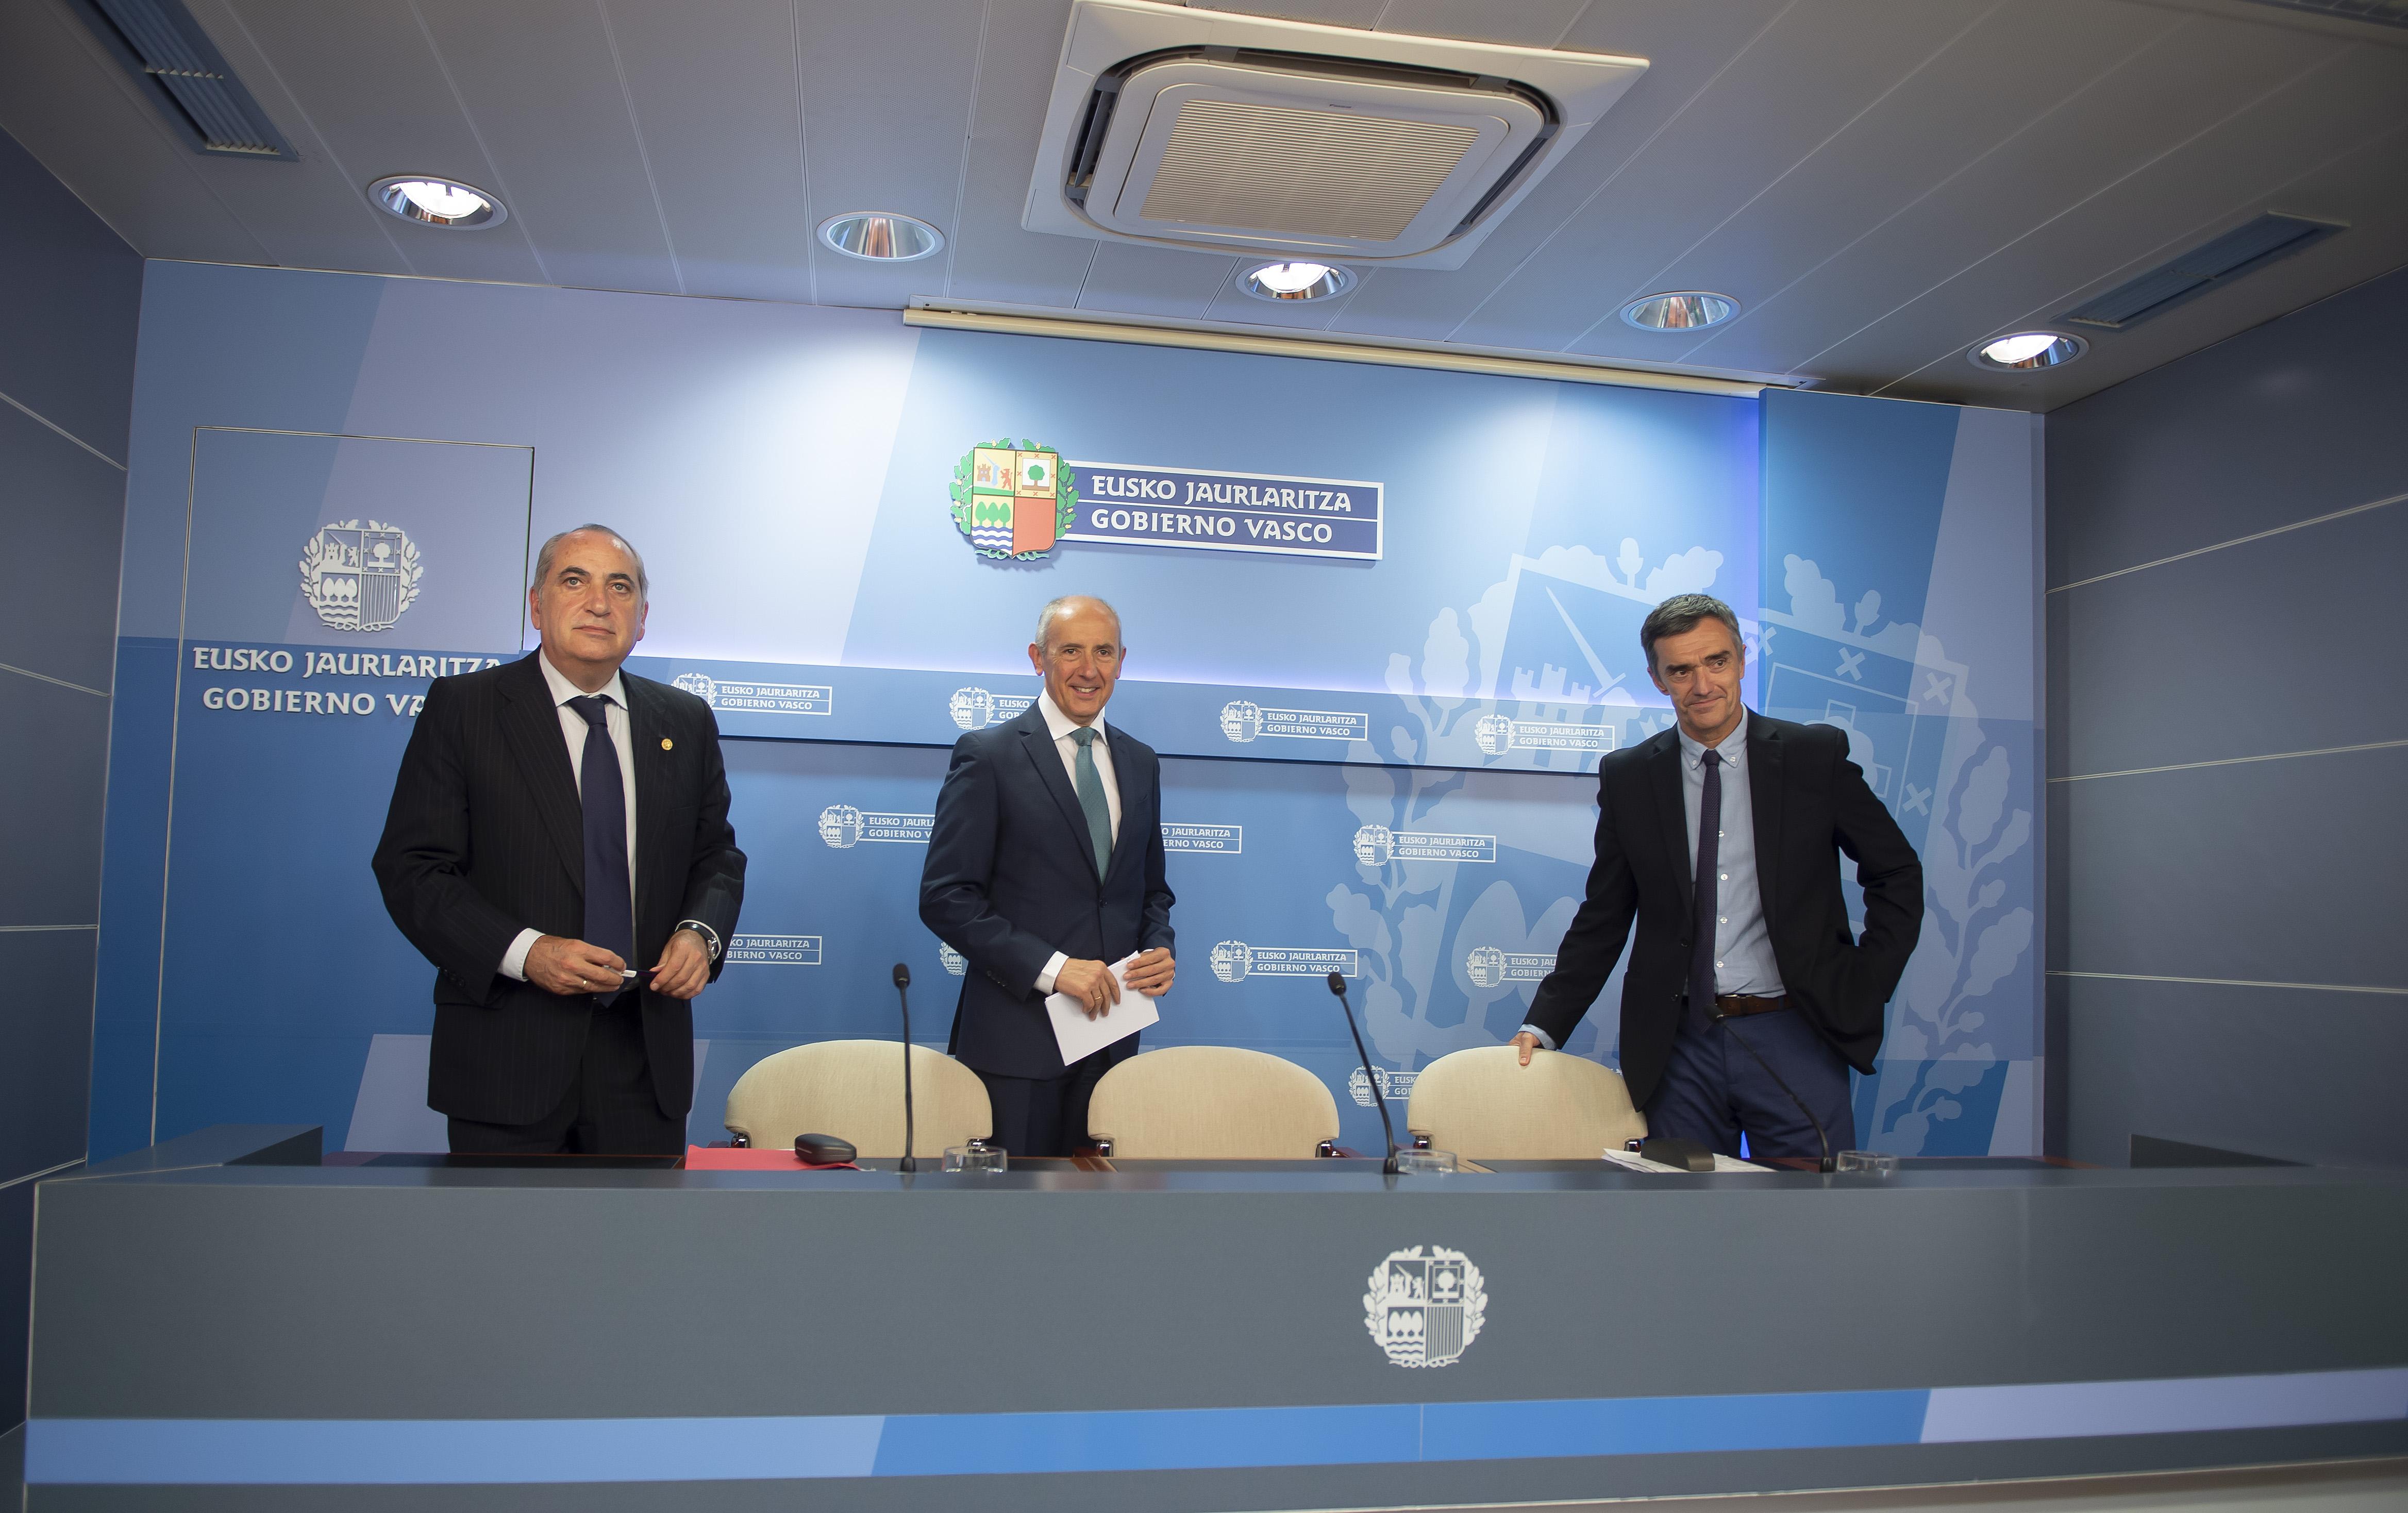 2019_06_25_consejo_gobierno_03.jpg